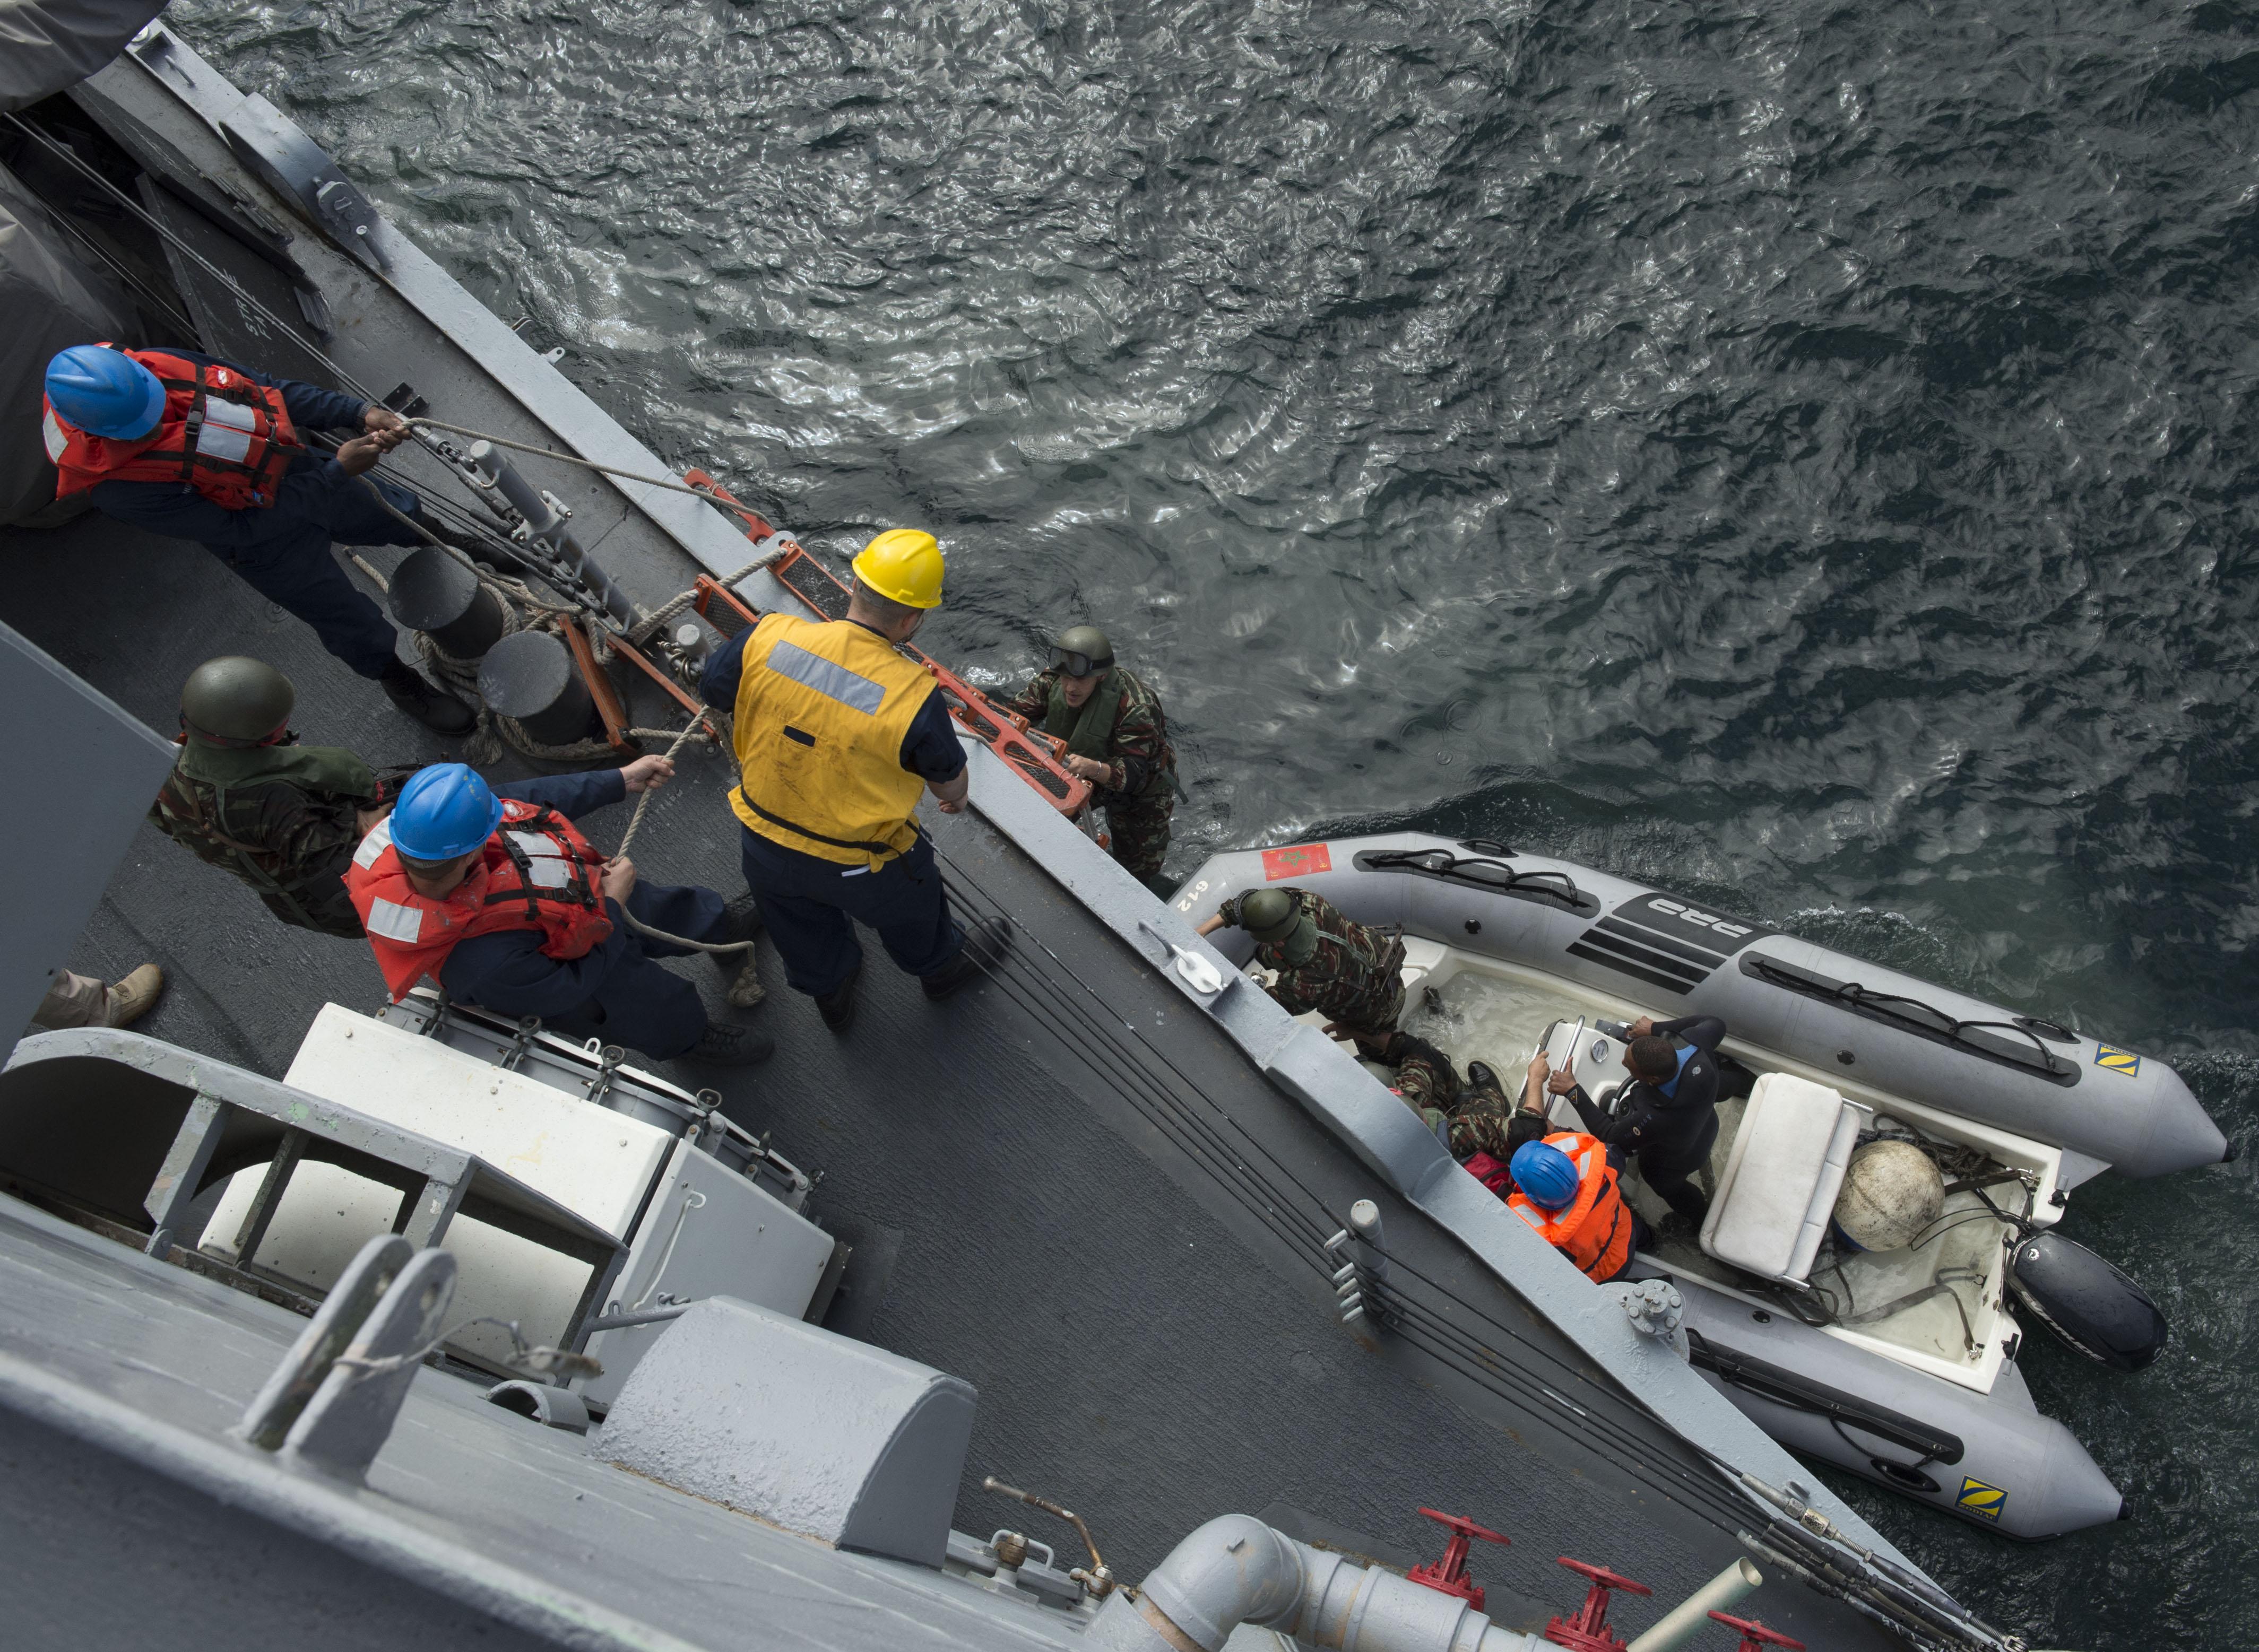 PASSEX 2014-3 : USS Simpson ( FFG56 ) et RMN Hassan II ( 612 ) 12990030885_18a95d8b9d_o